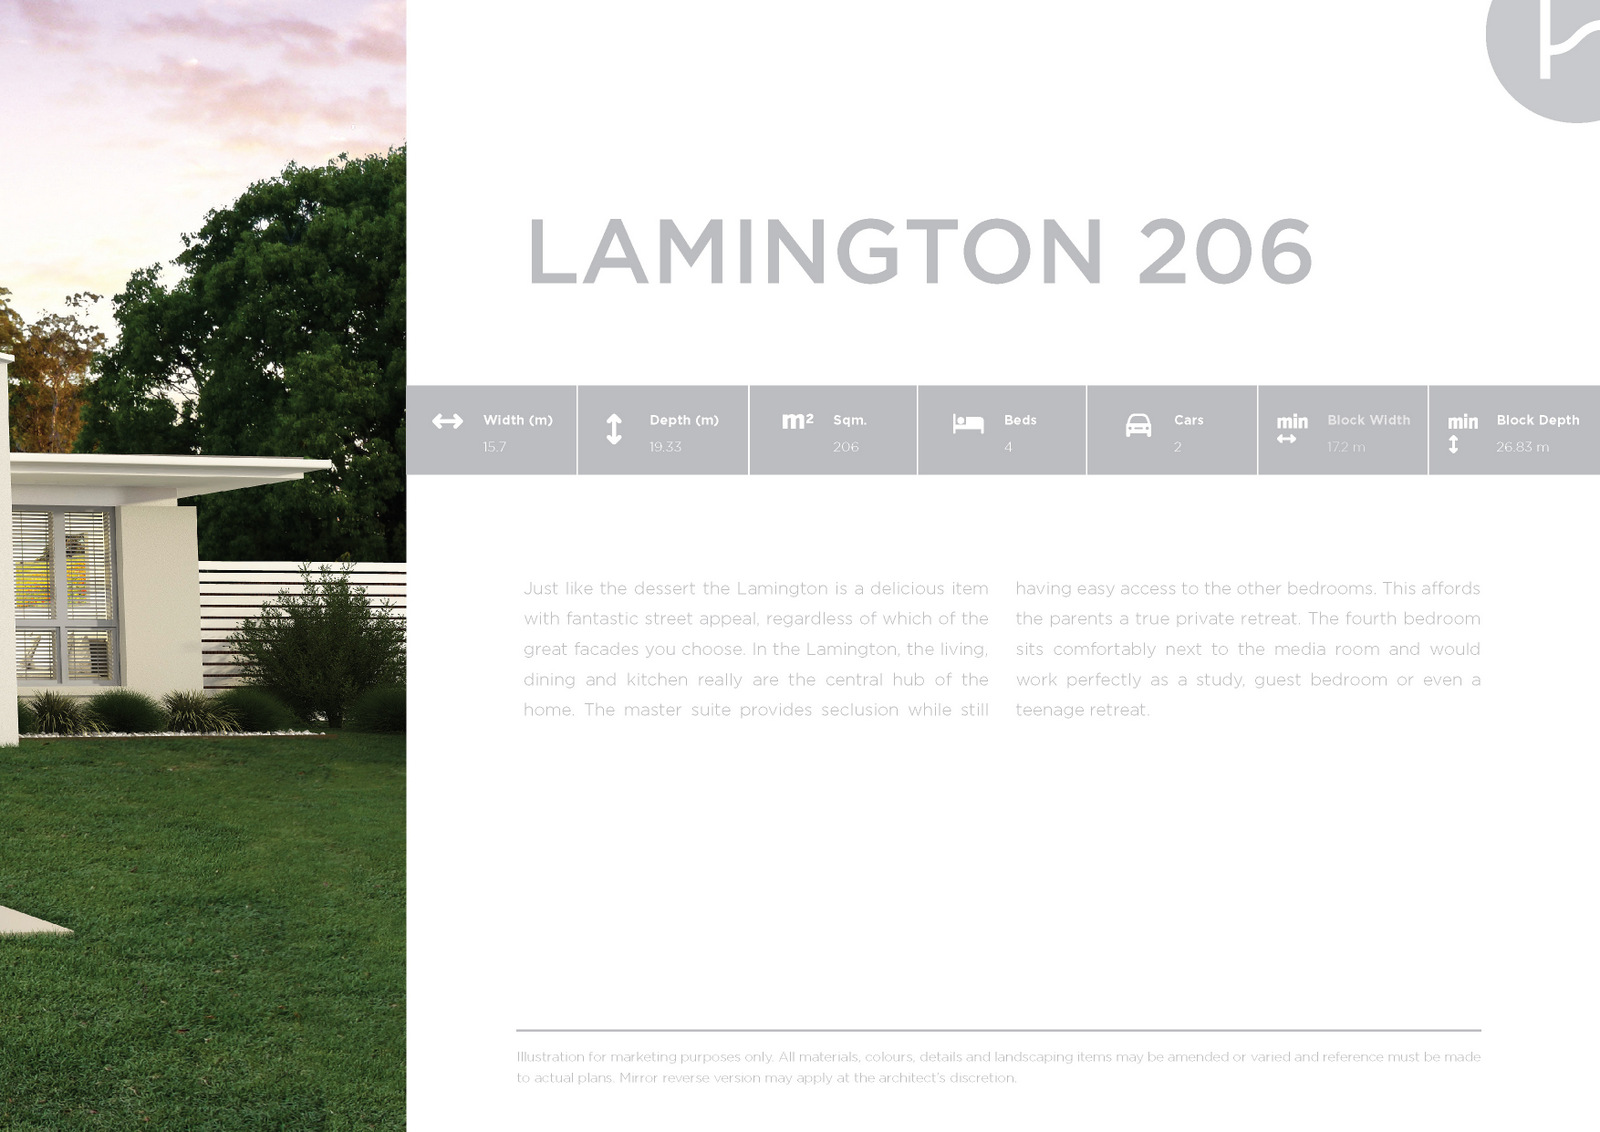 The Lamington 206